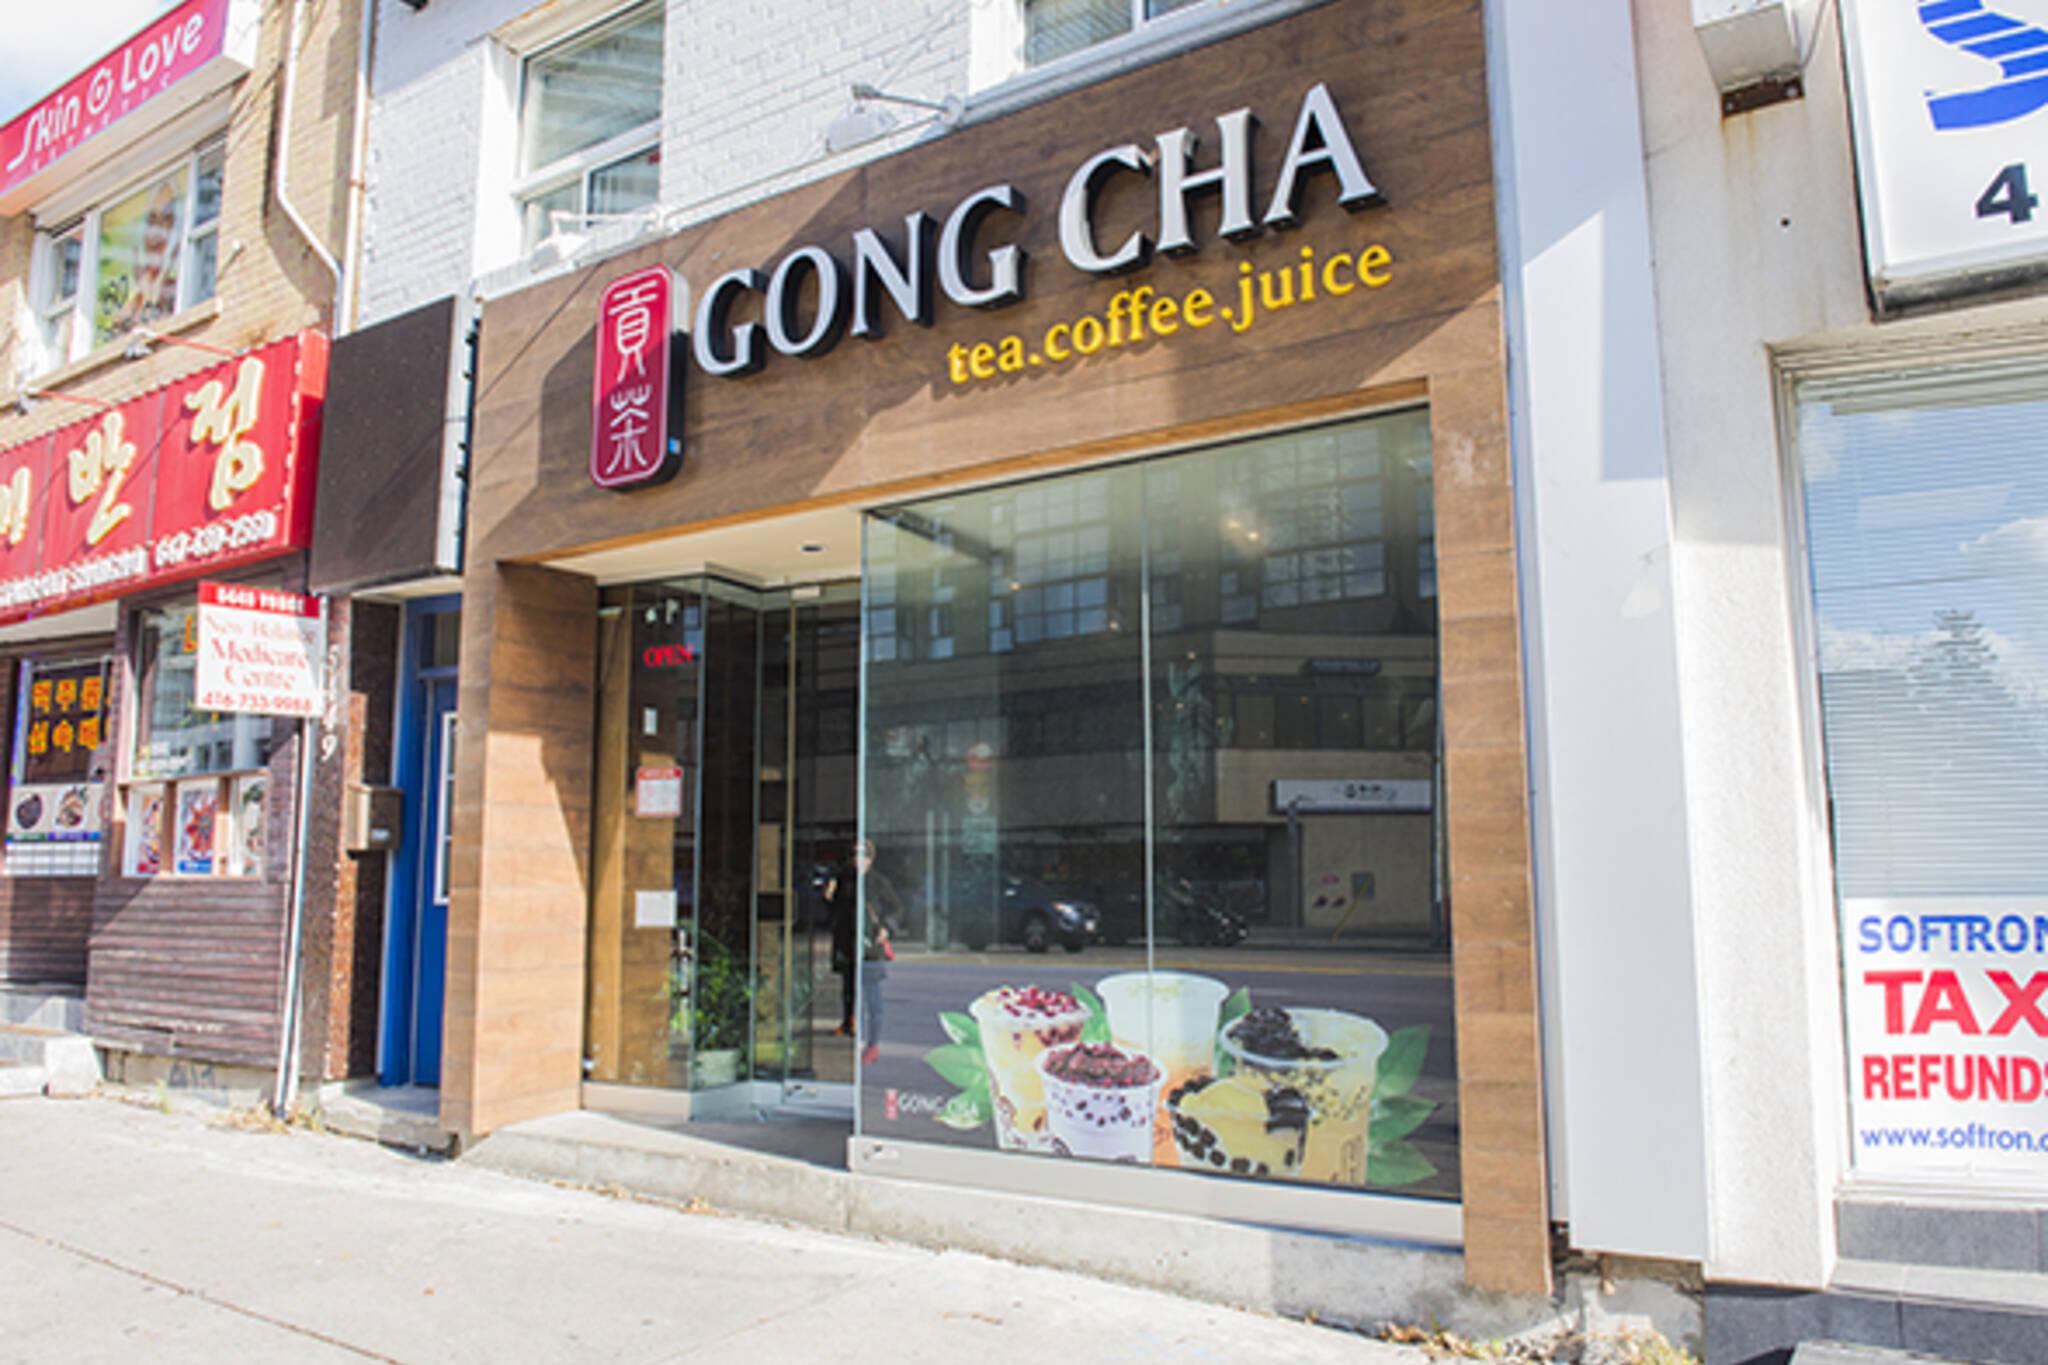 Gong Cha Toronto